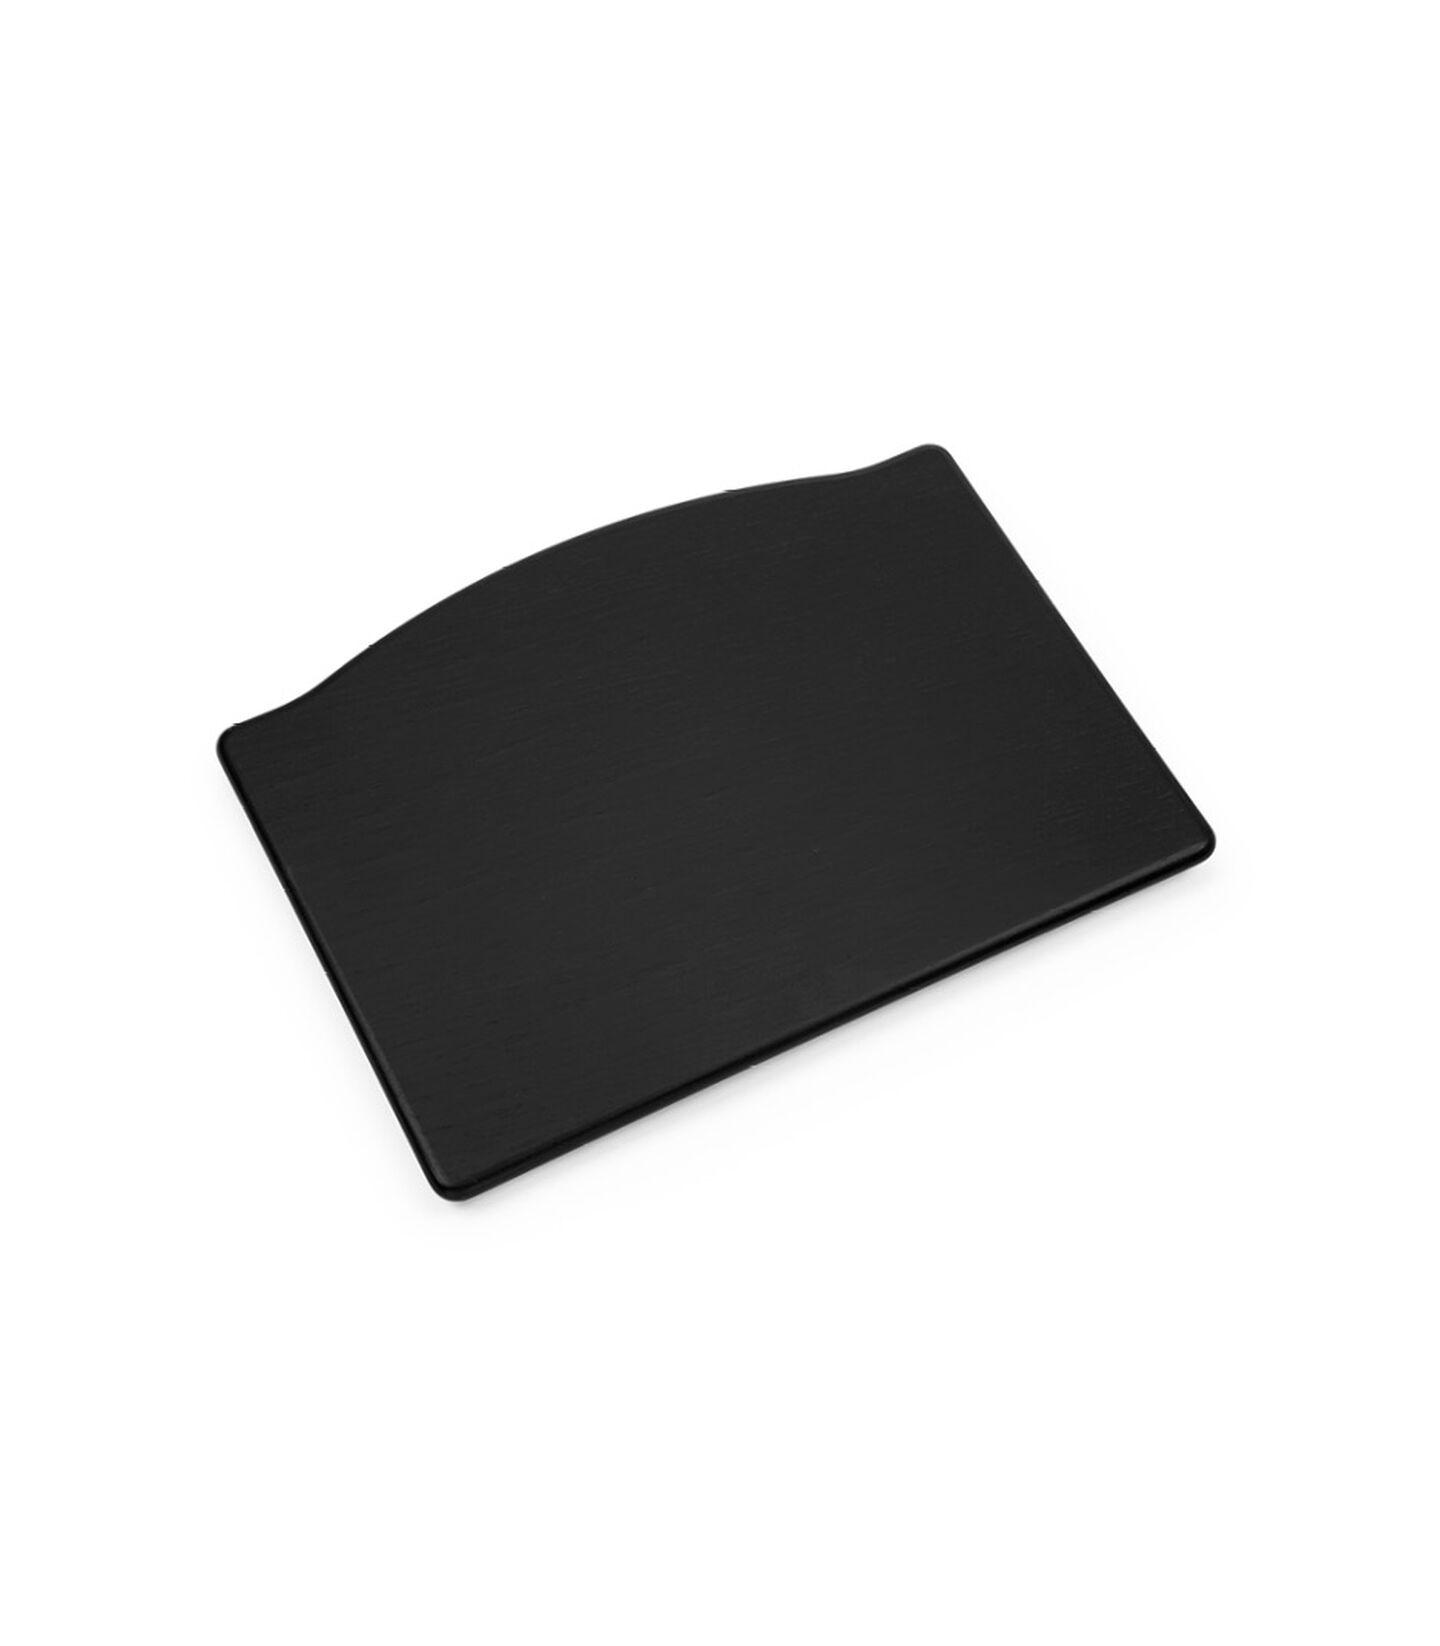 Tripp Trapp® Footplate Oak Black, Rovere Nero, mainview